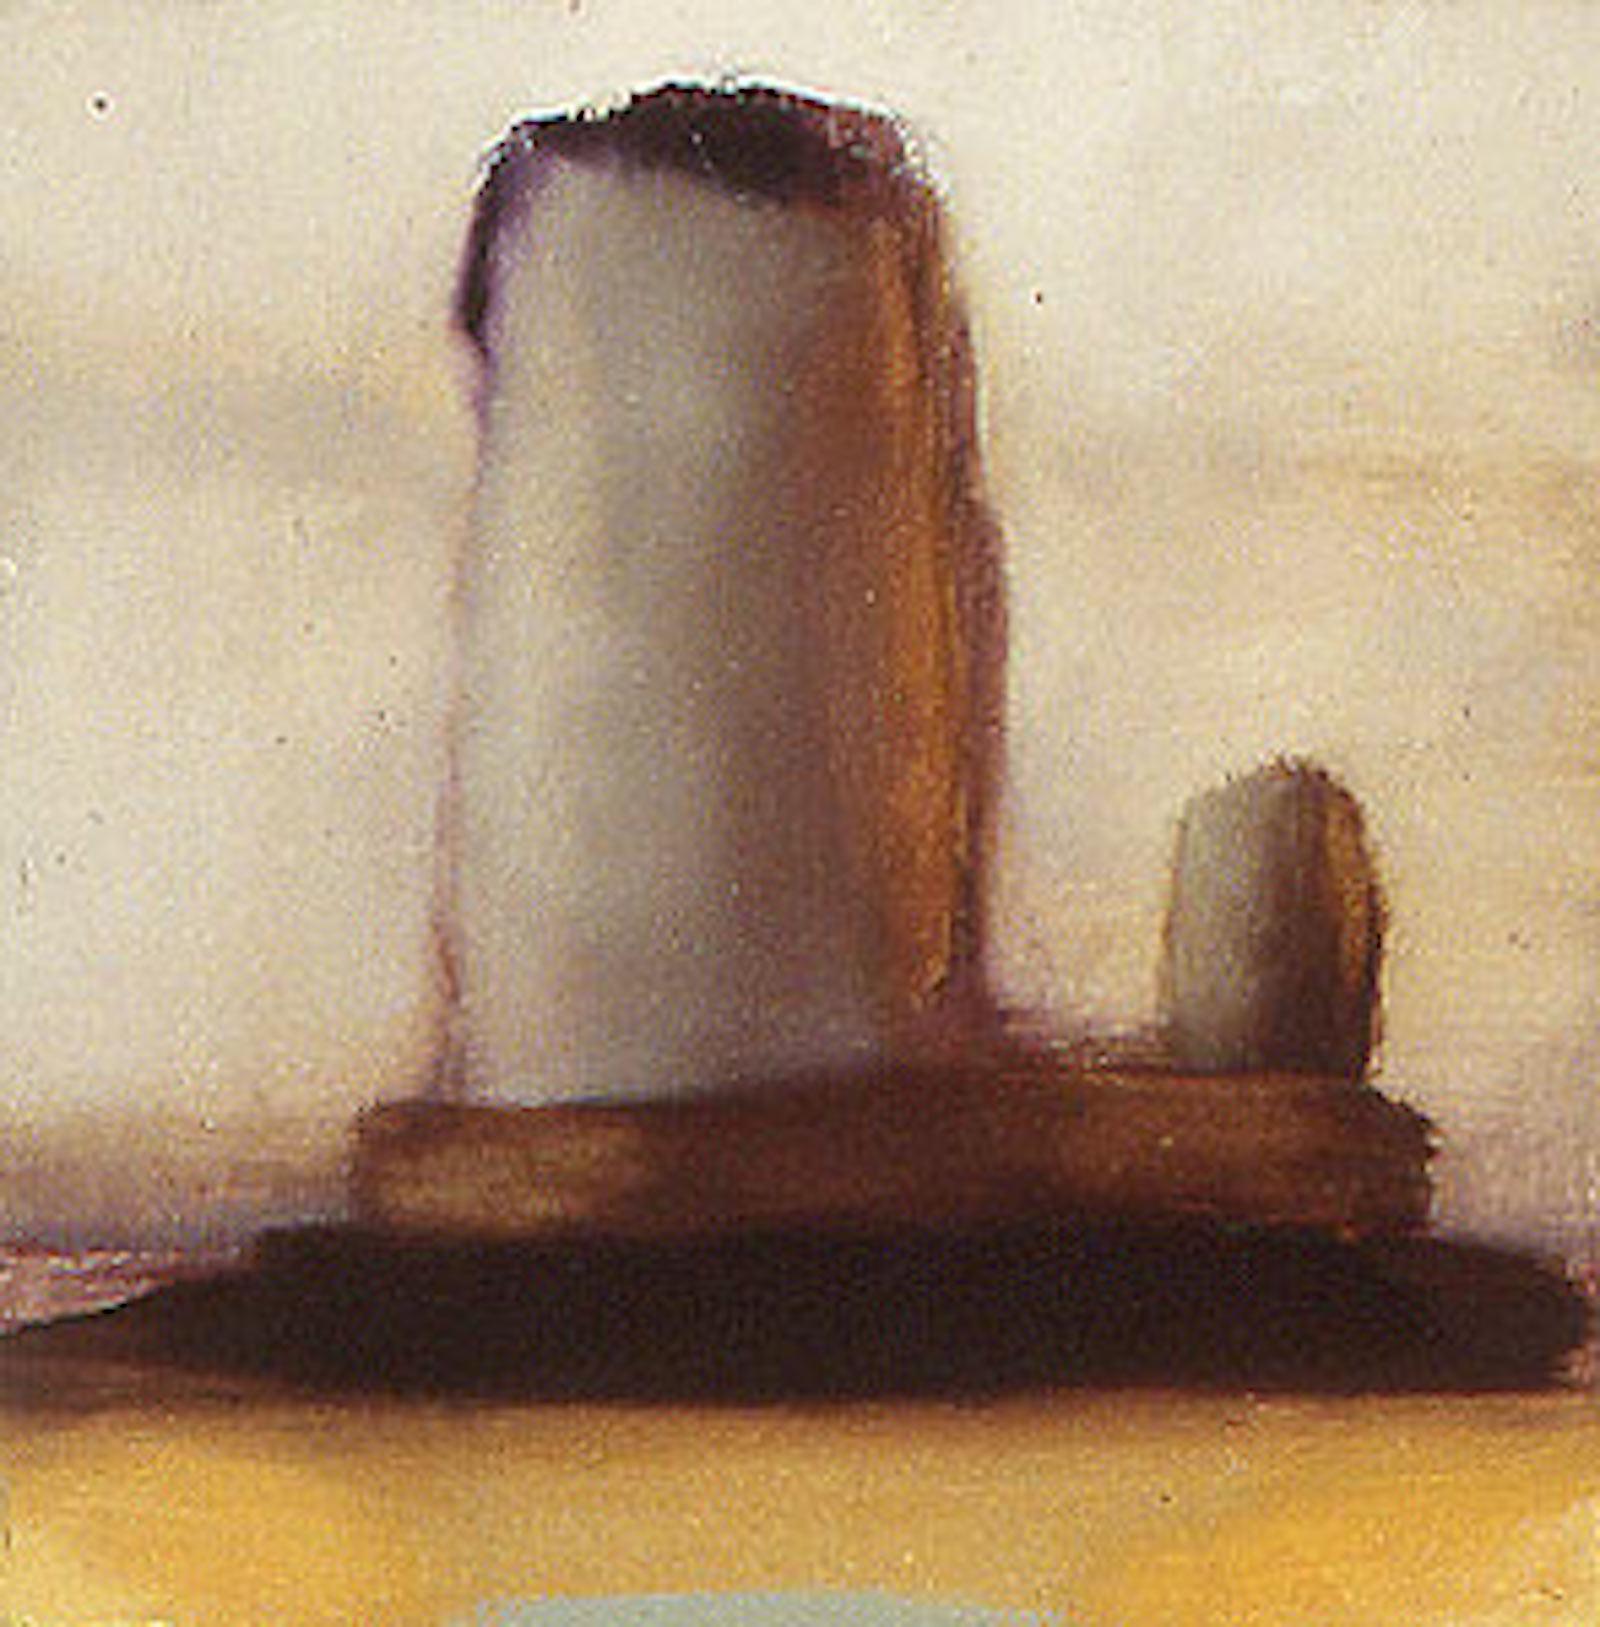 Kaksin, 25 x 25 cm, 2003